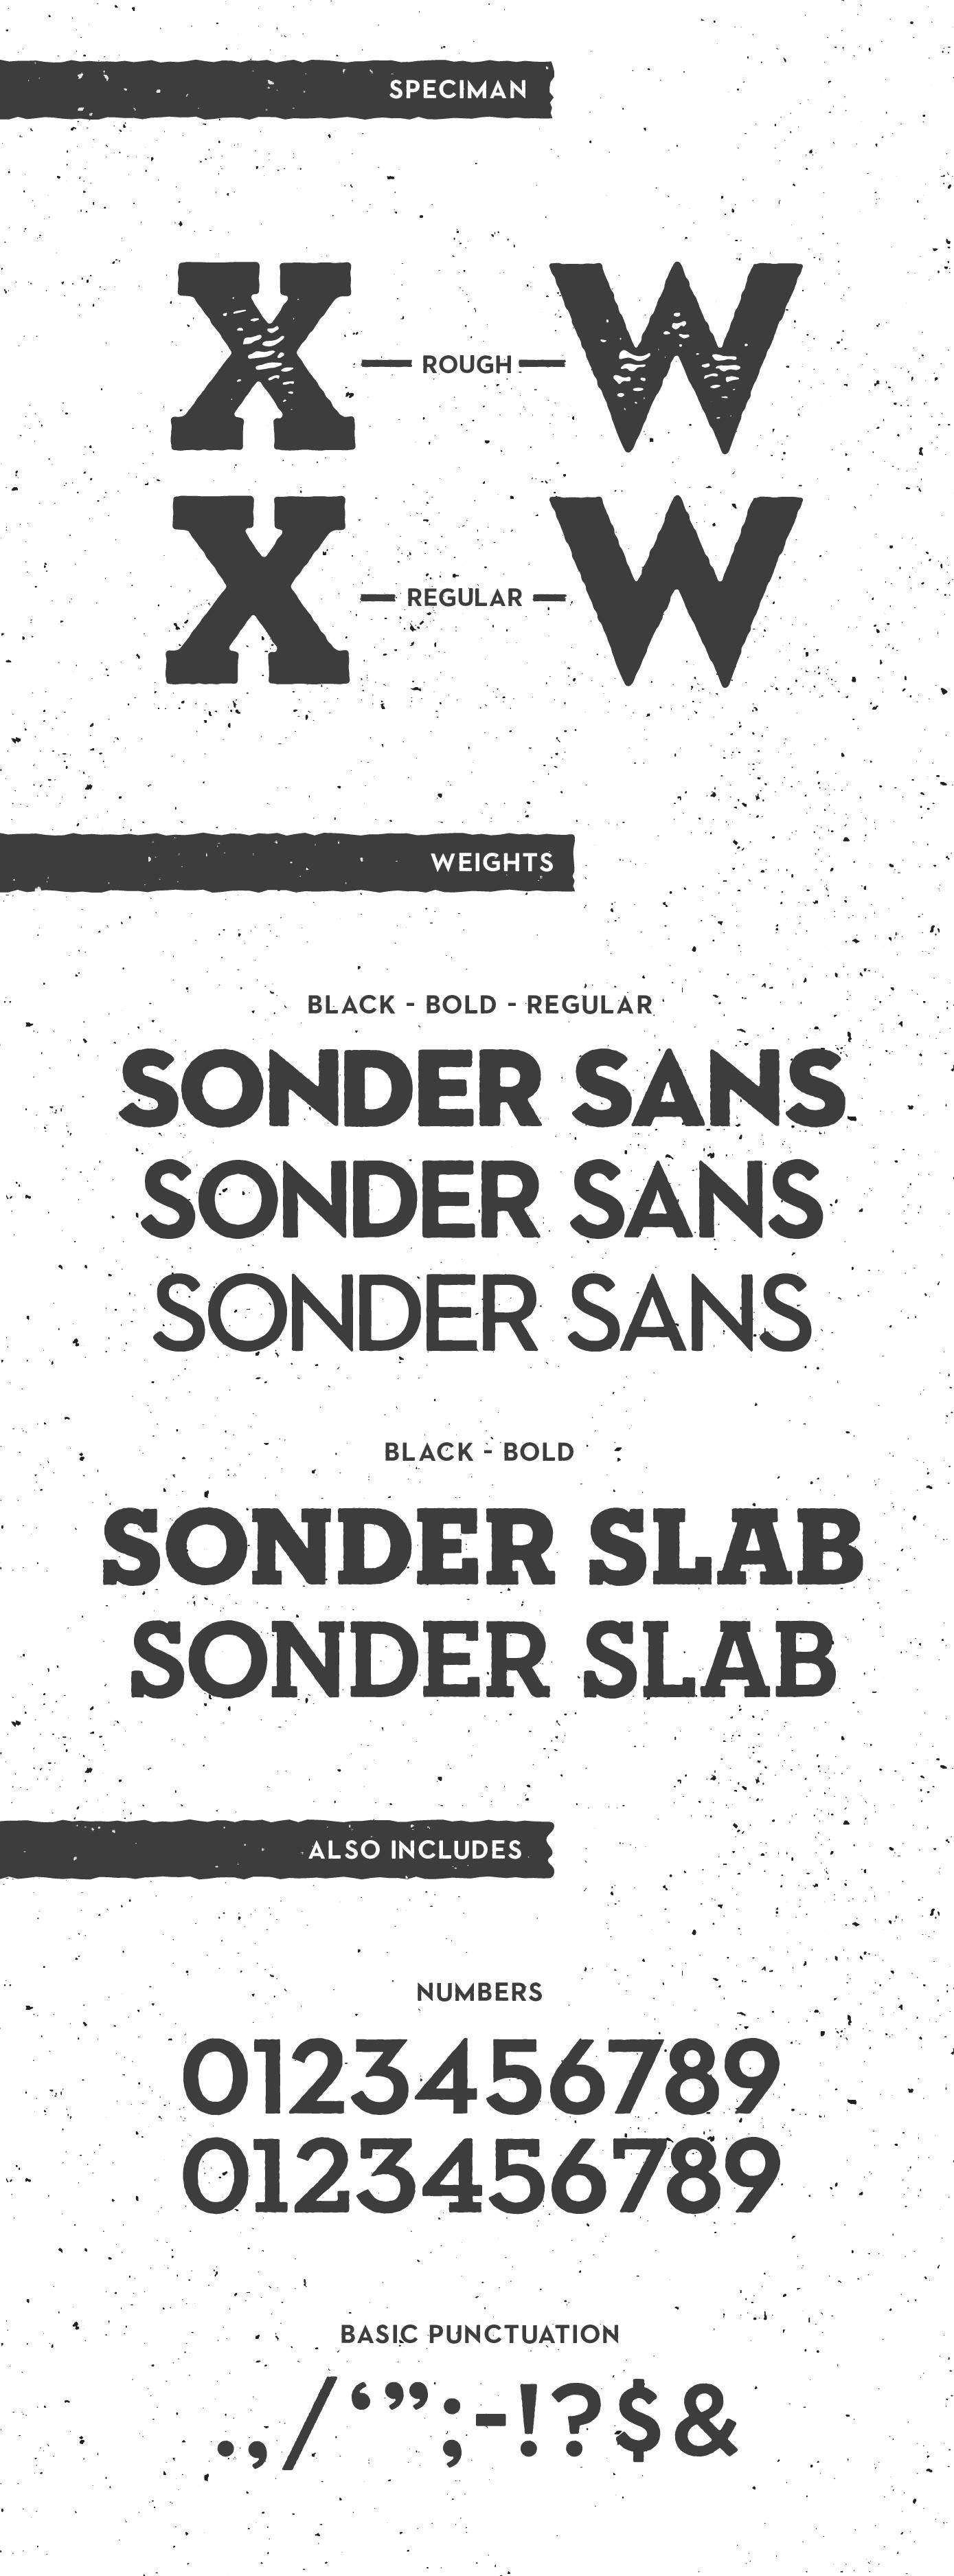 Sonder Free Font Family - slab-serif, sans-serif